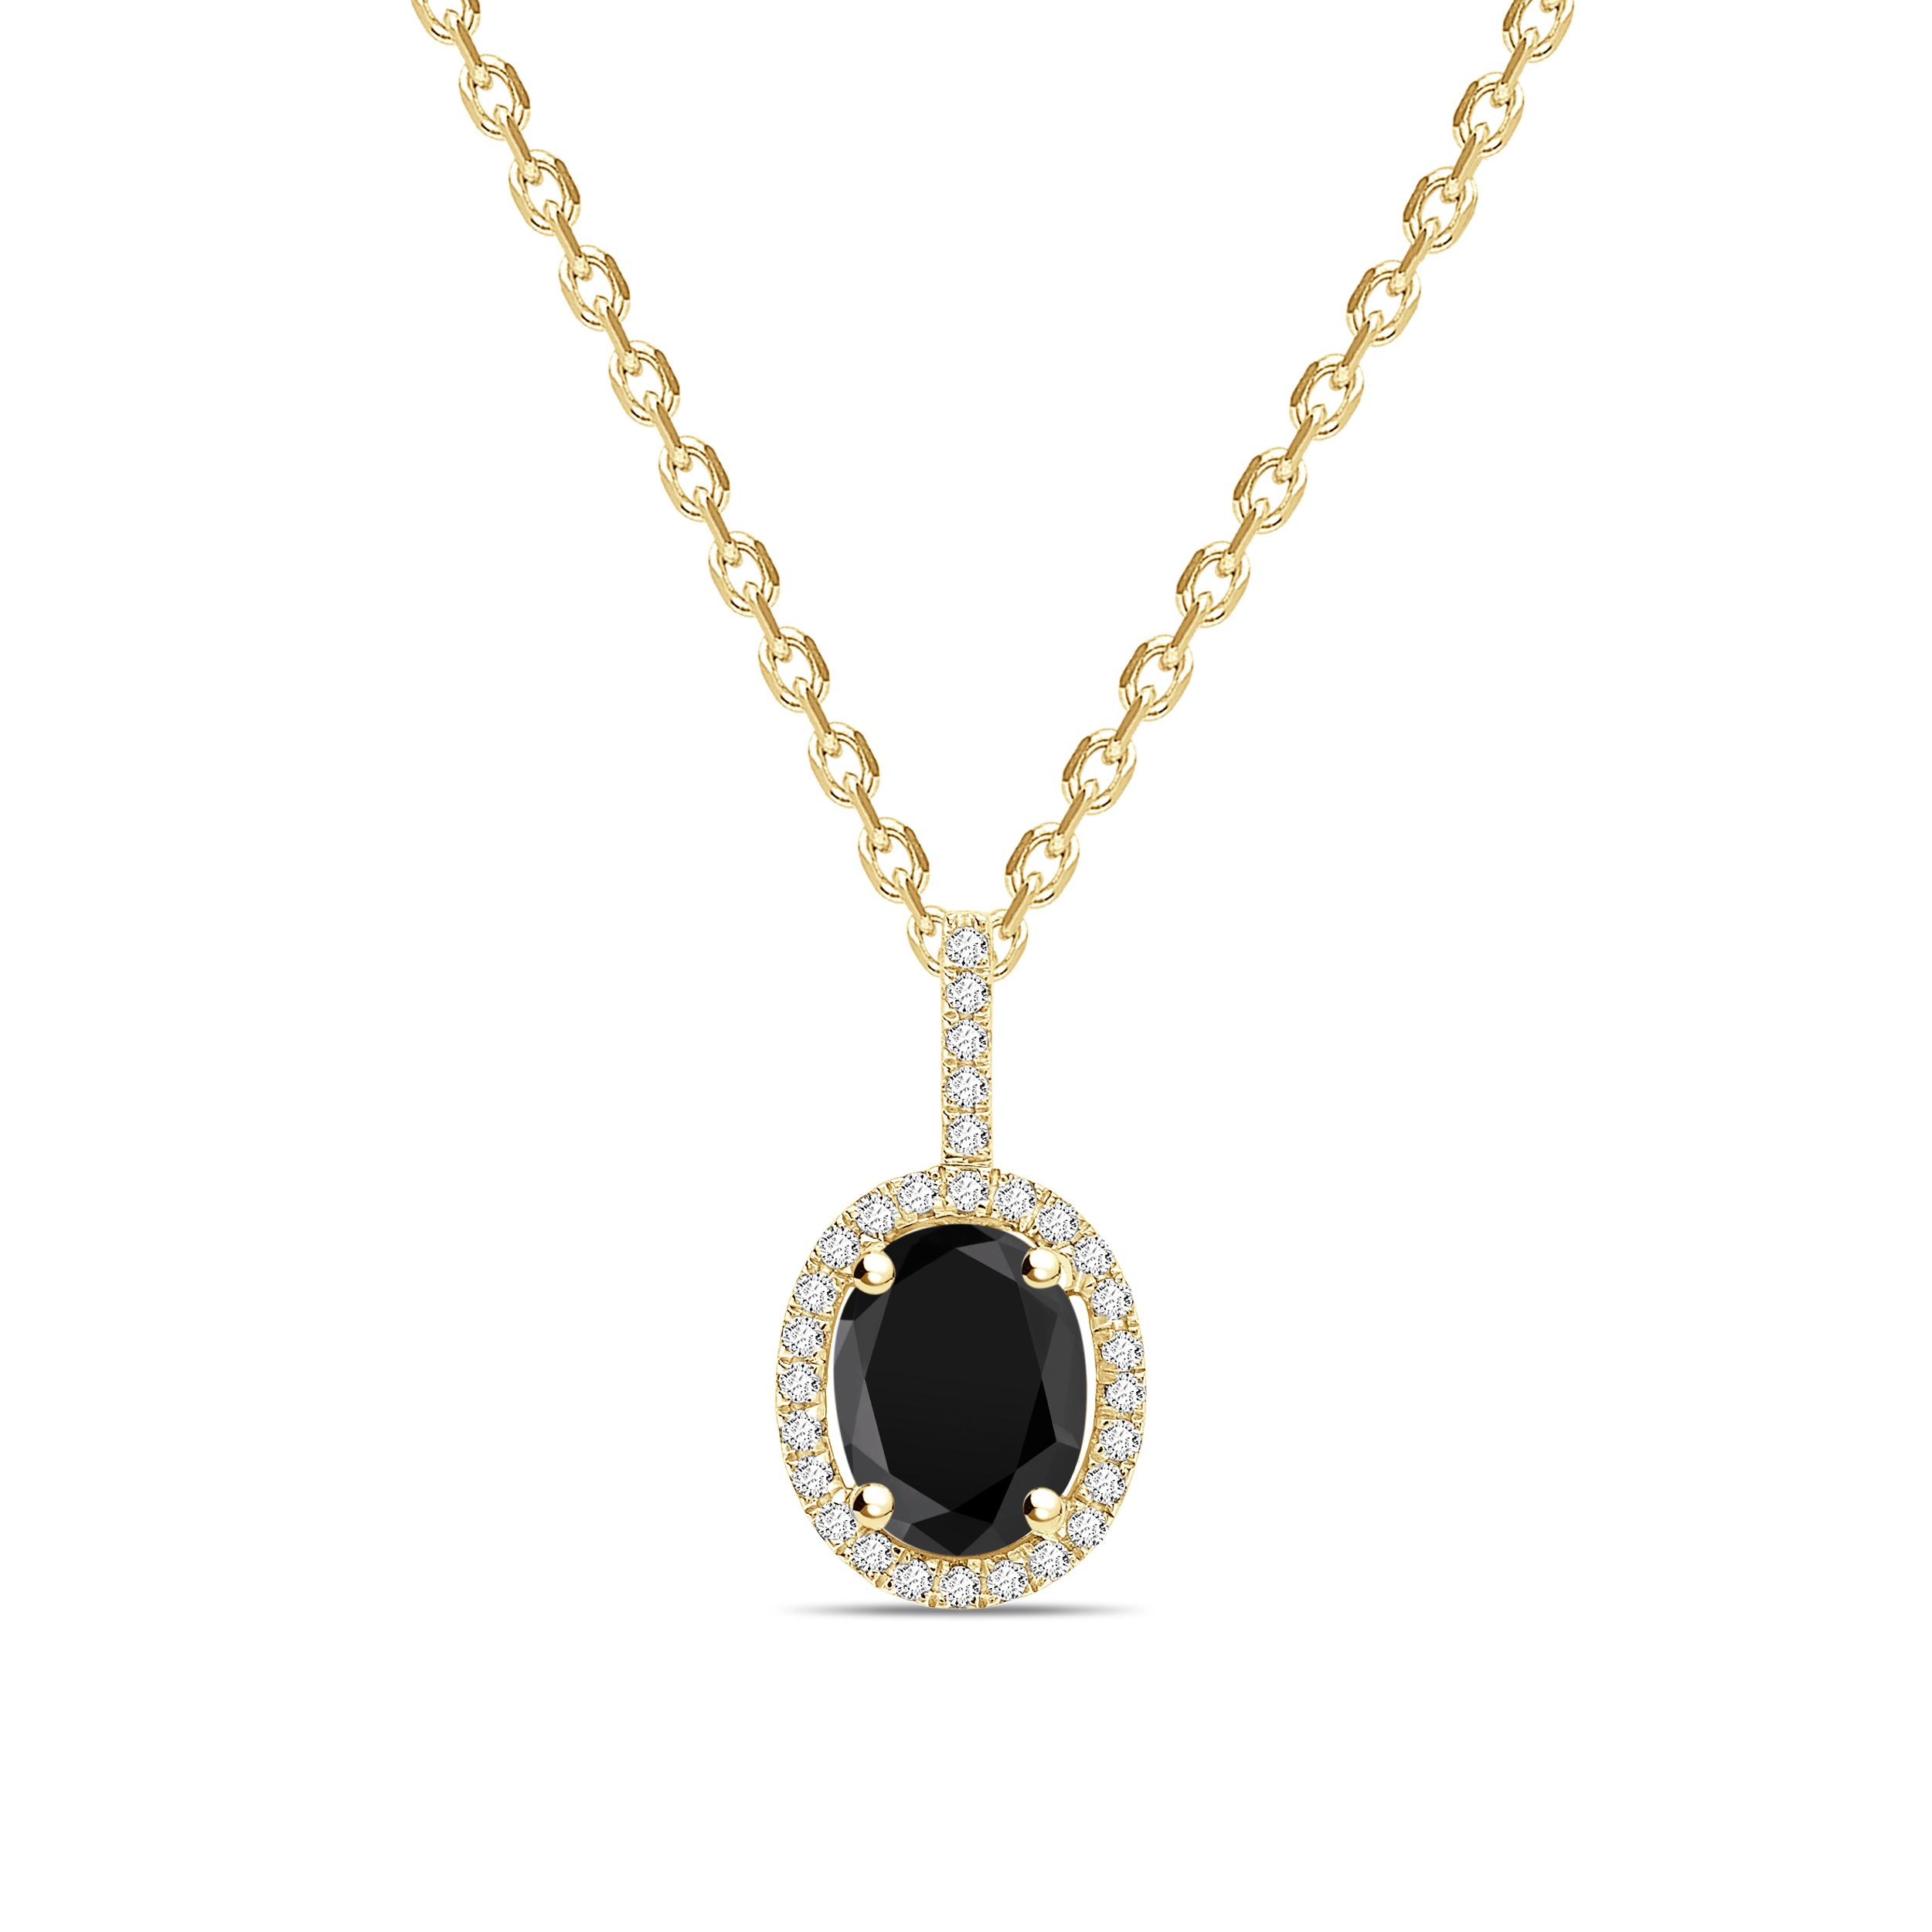 Oval Shape Halo Style Black Diamond Solitaire Pendants Necklace